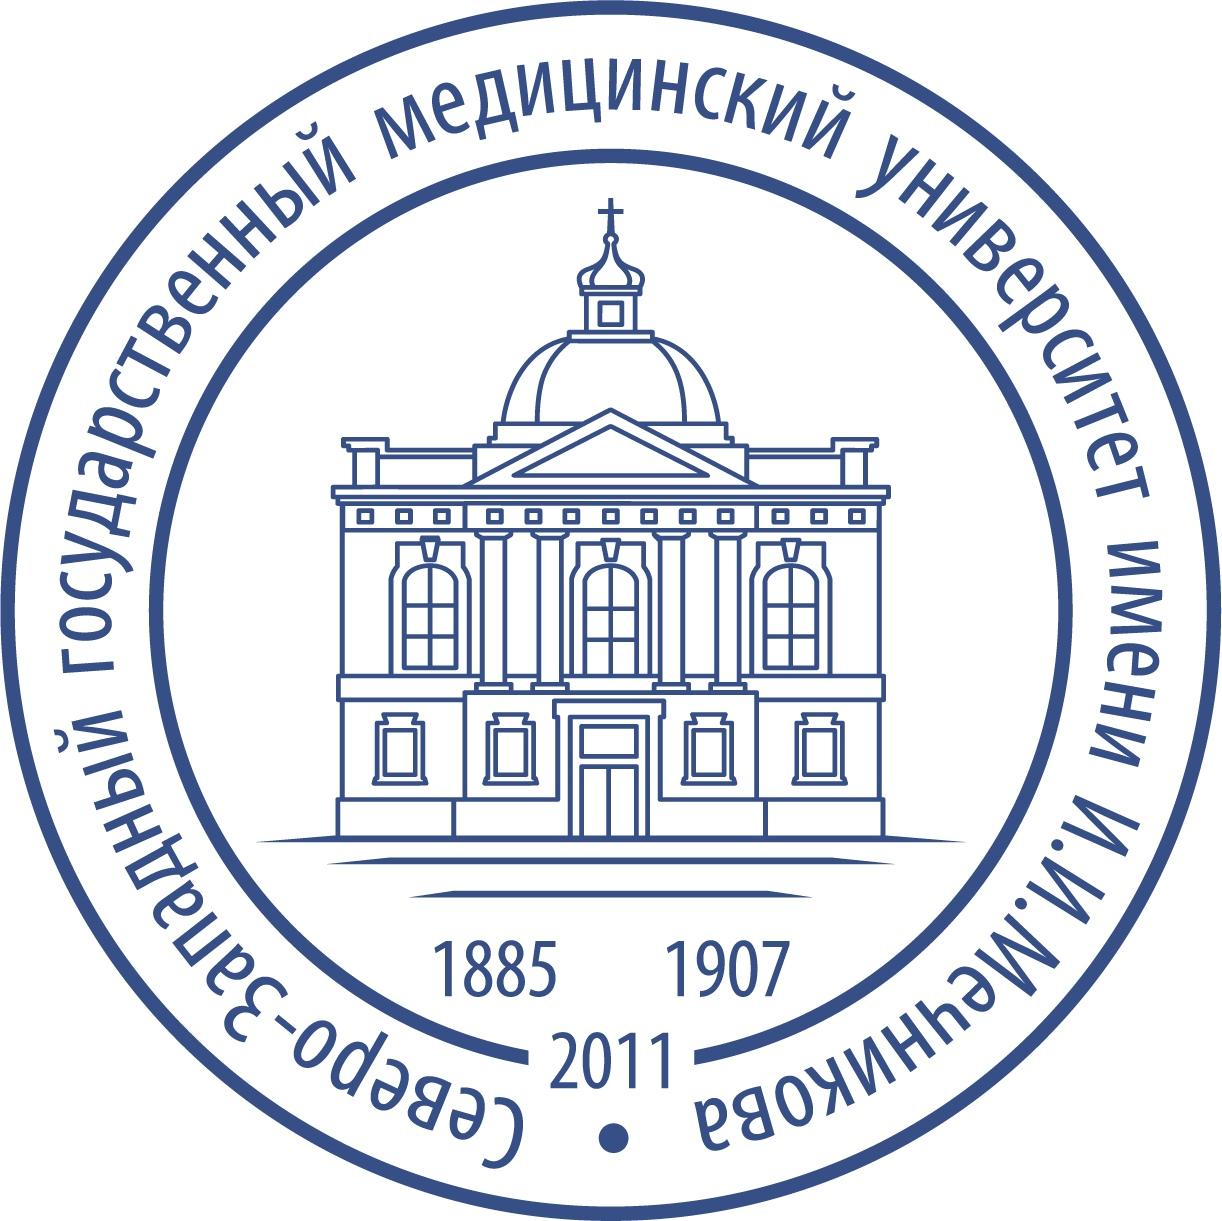 Мечникова (Спб)